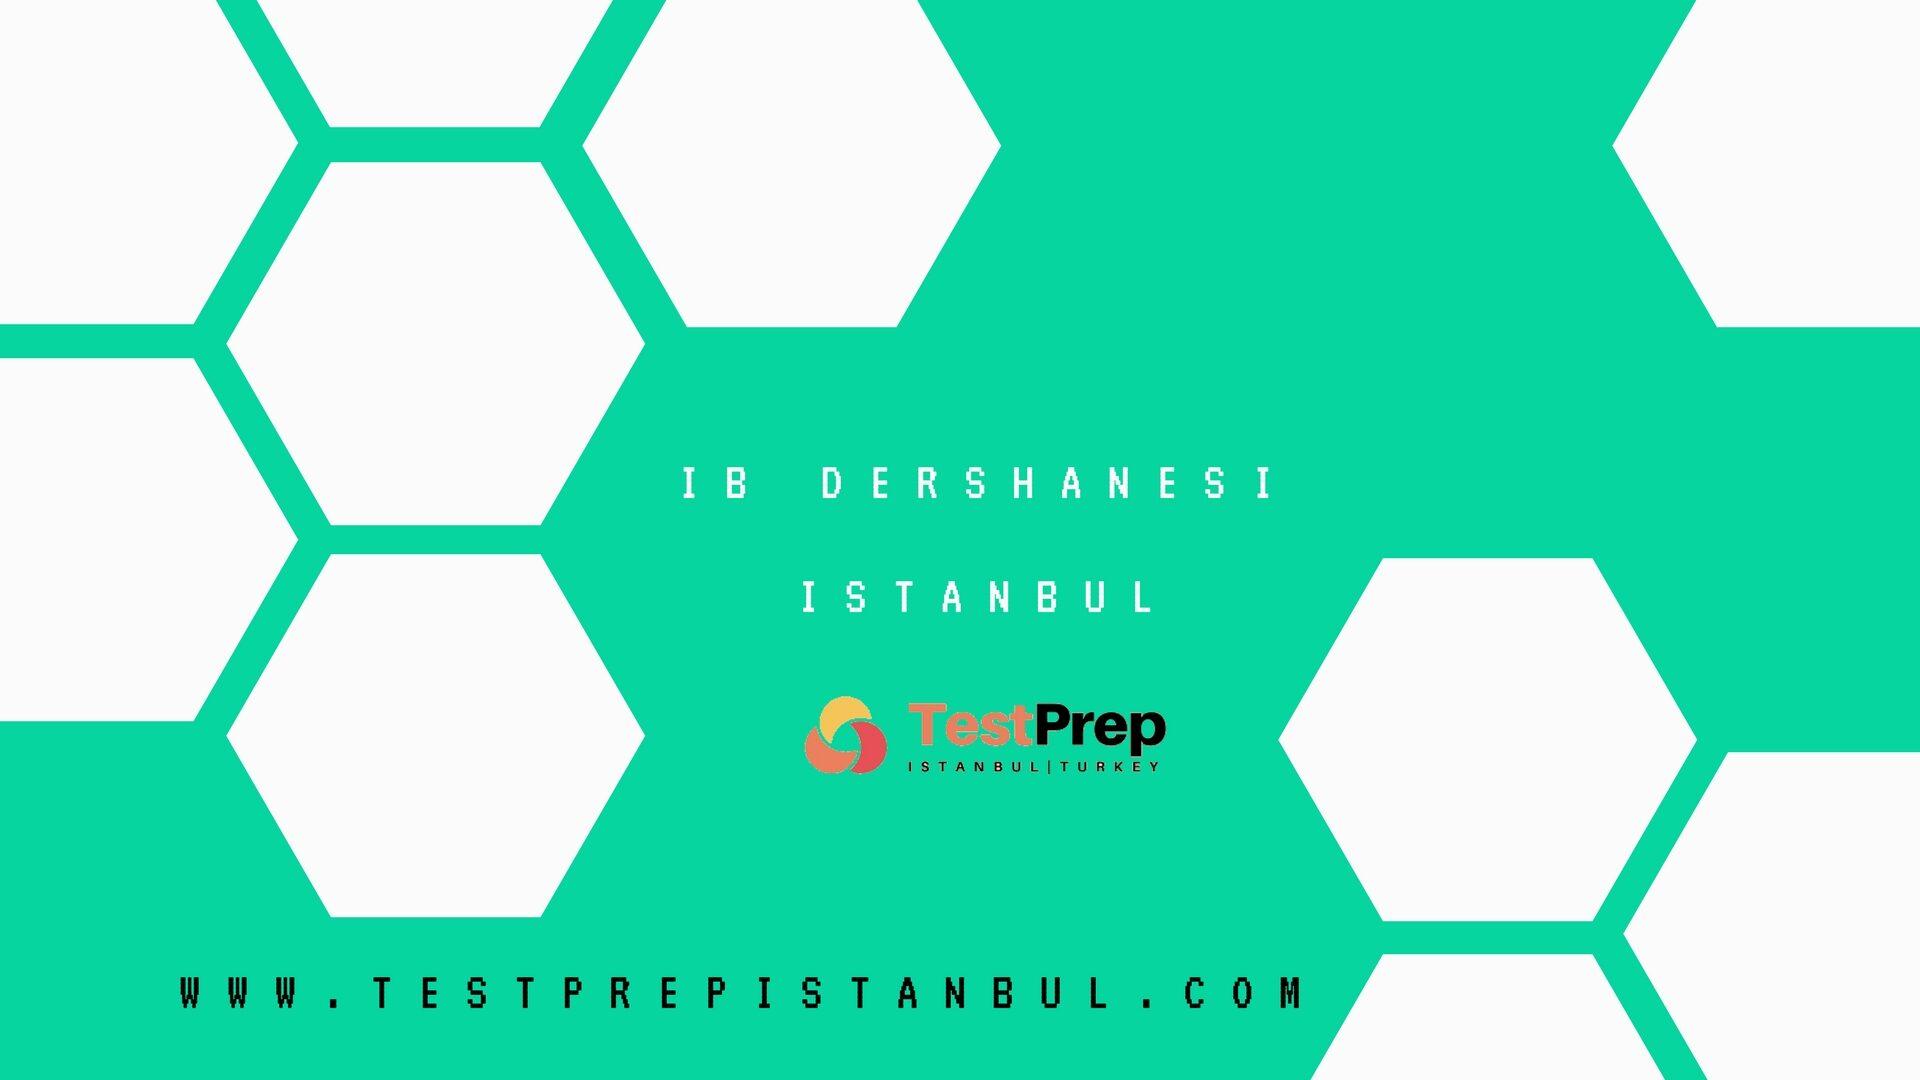 ib dershanesi istanbul. ib özel ders ve ib kursu istanbul.